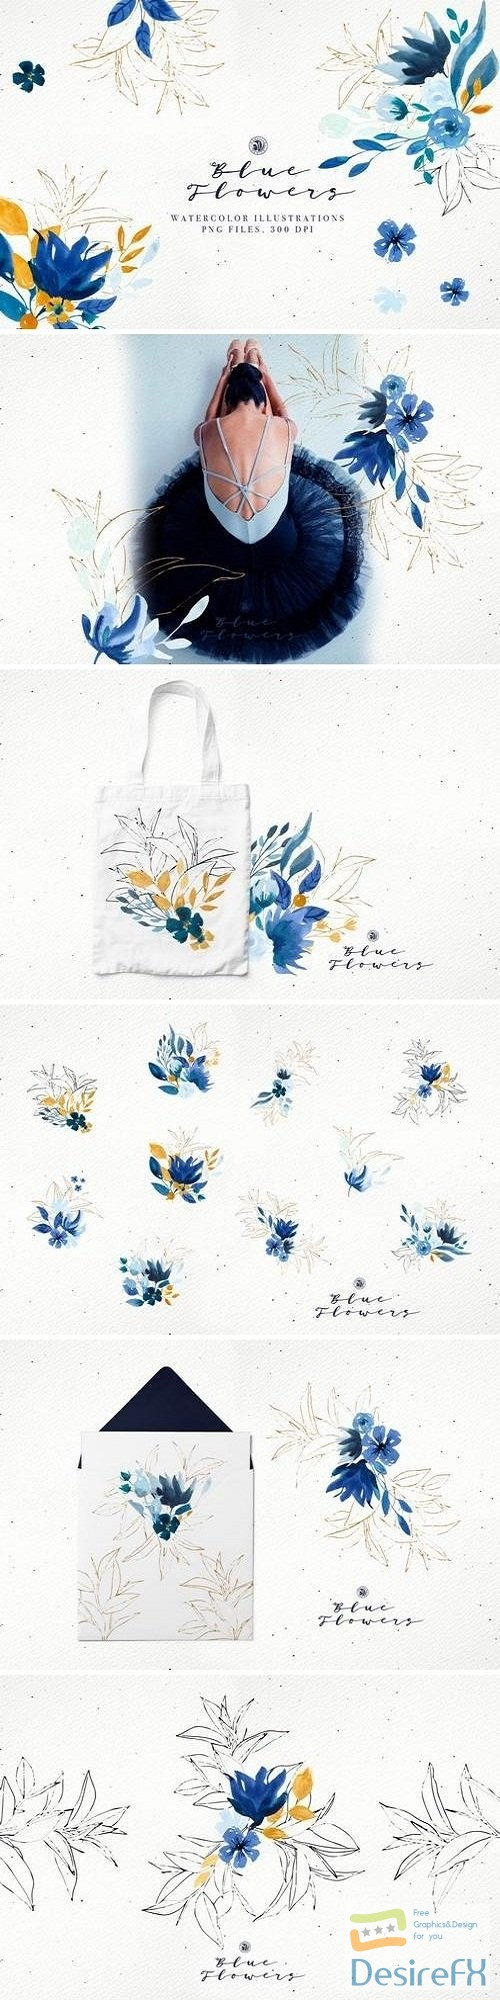 photoshop - Blue Flowers - 3468058